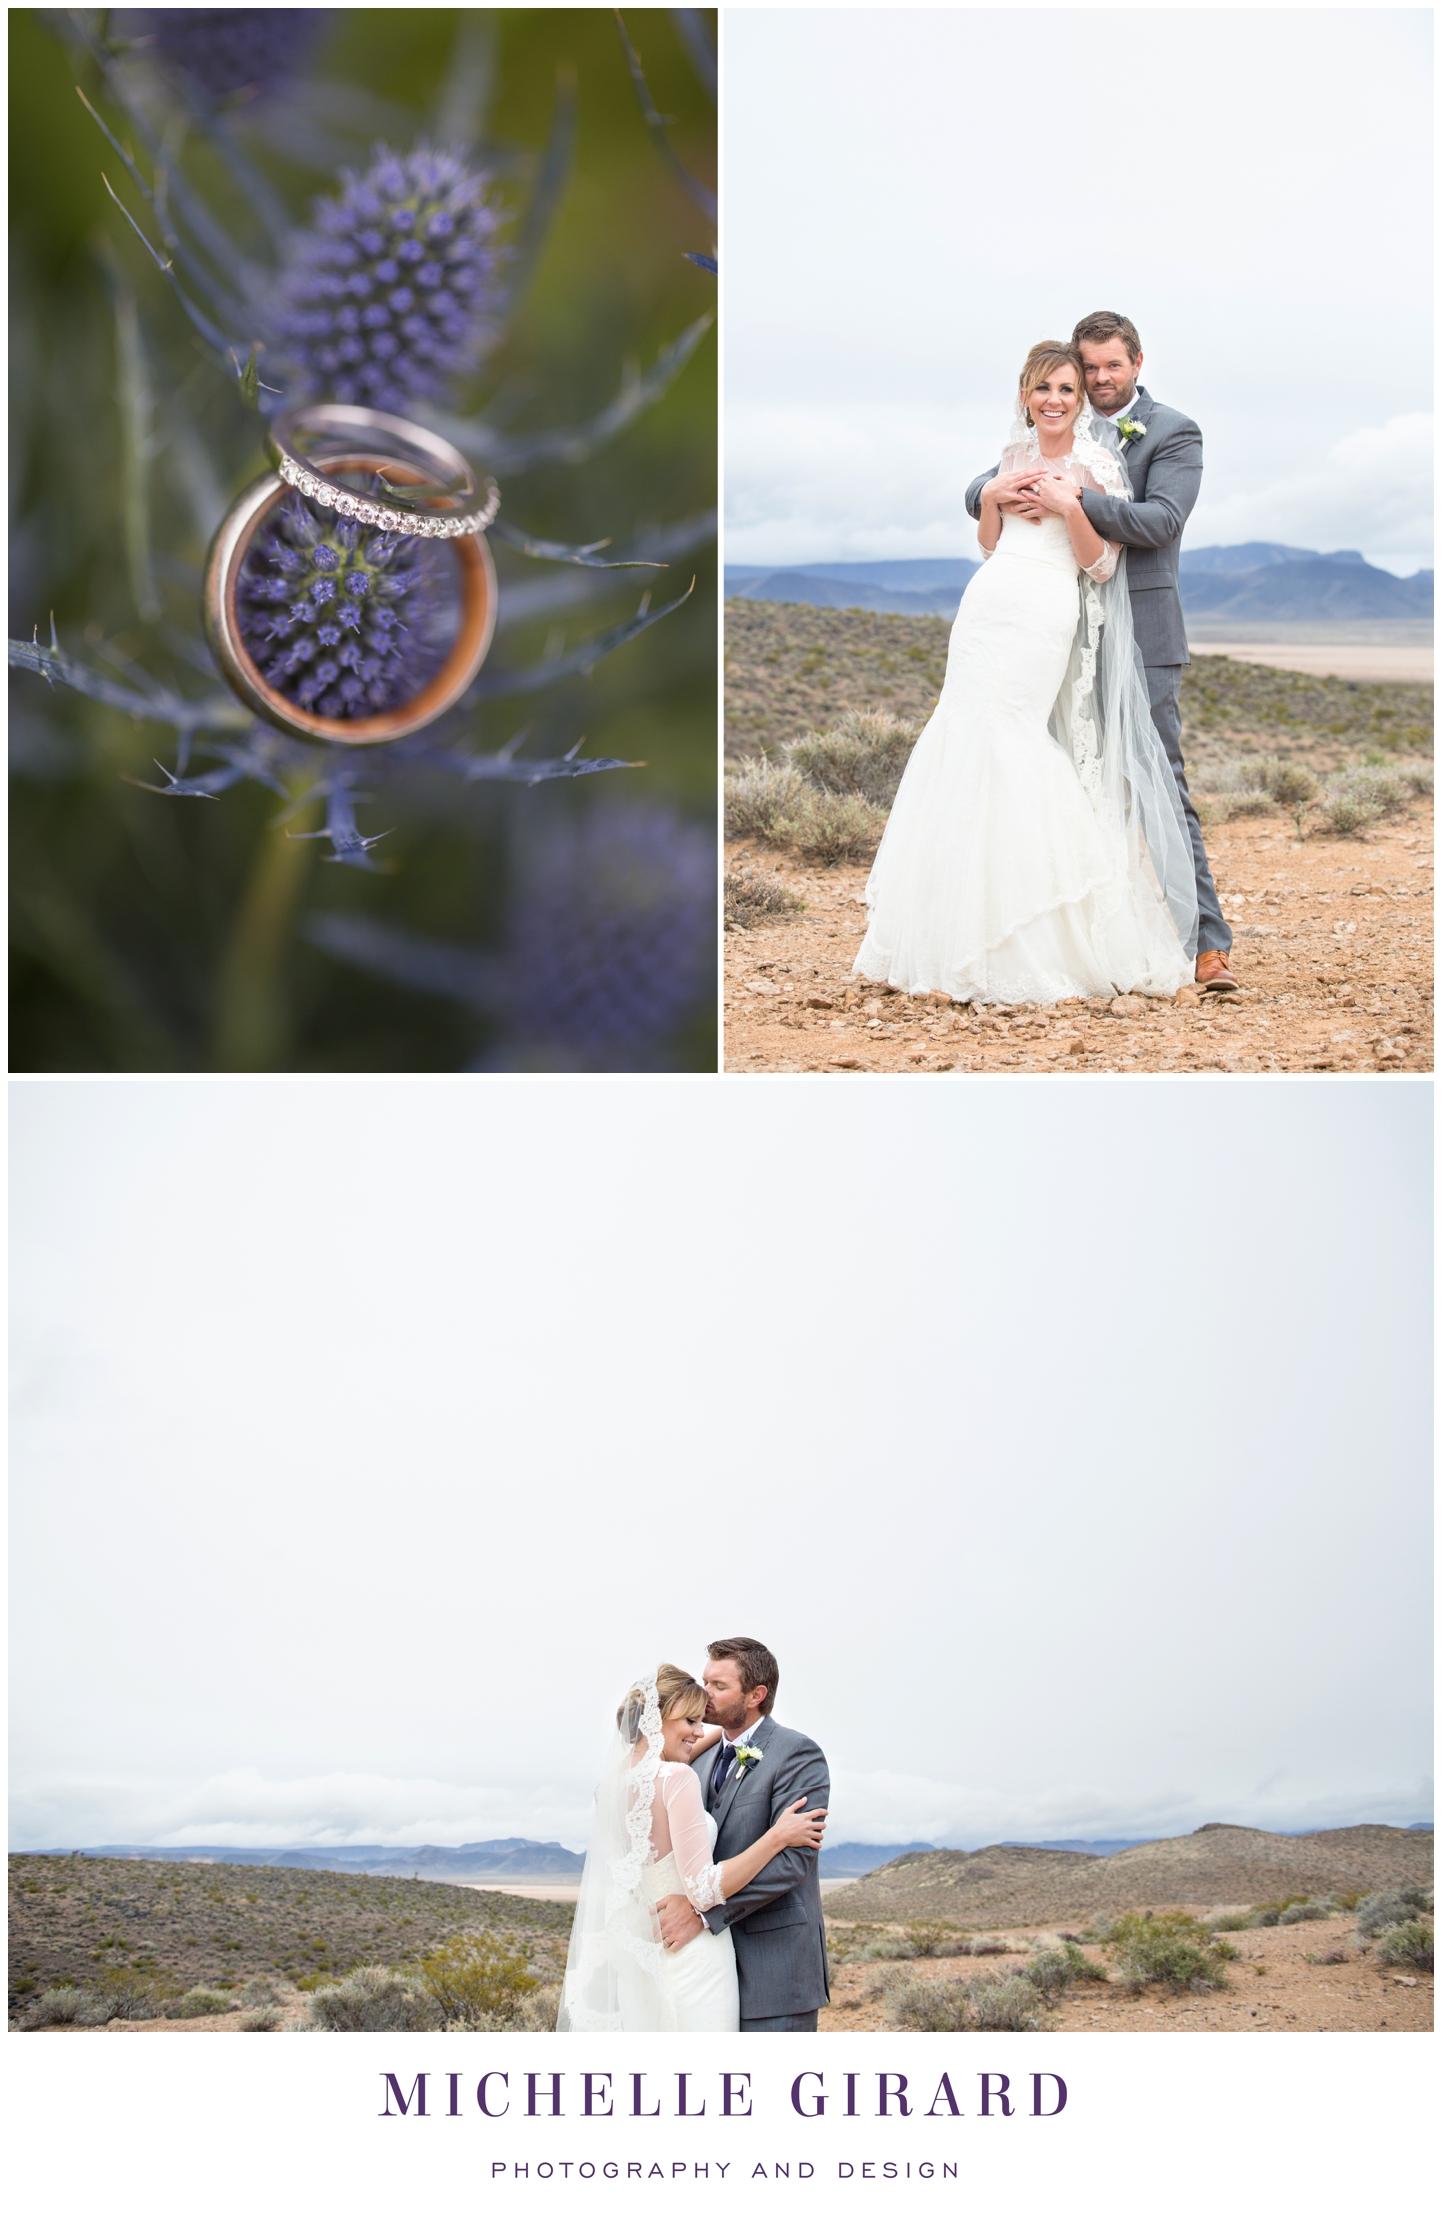 nevada-desert-lace-veil-michelle-girard-wedding-photography14.jpg